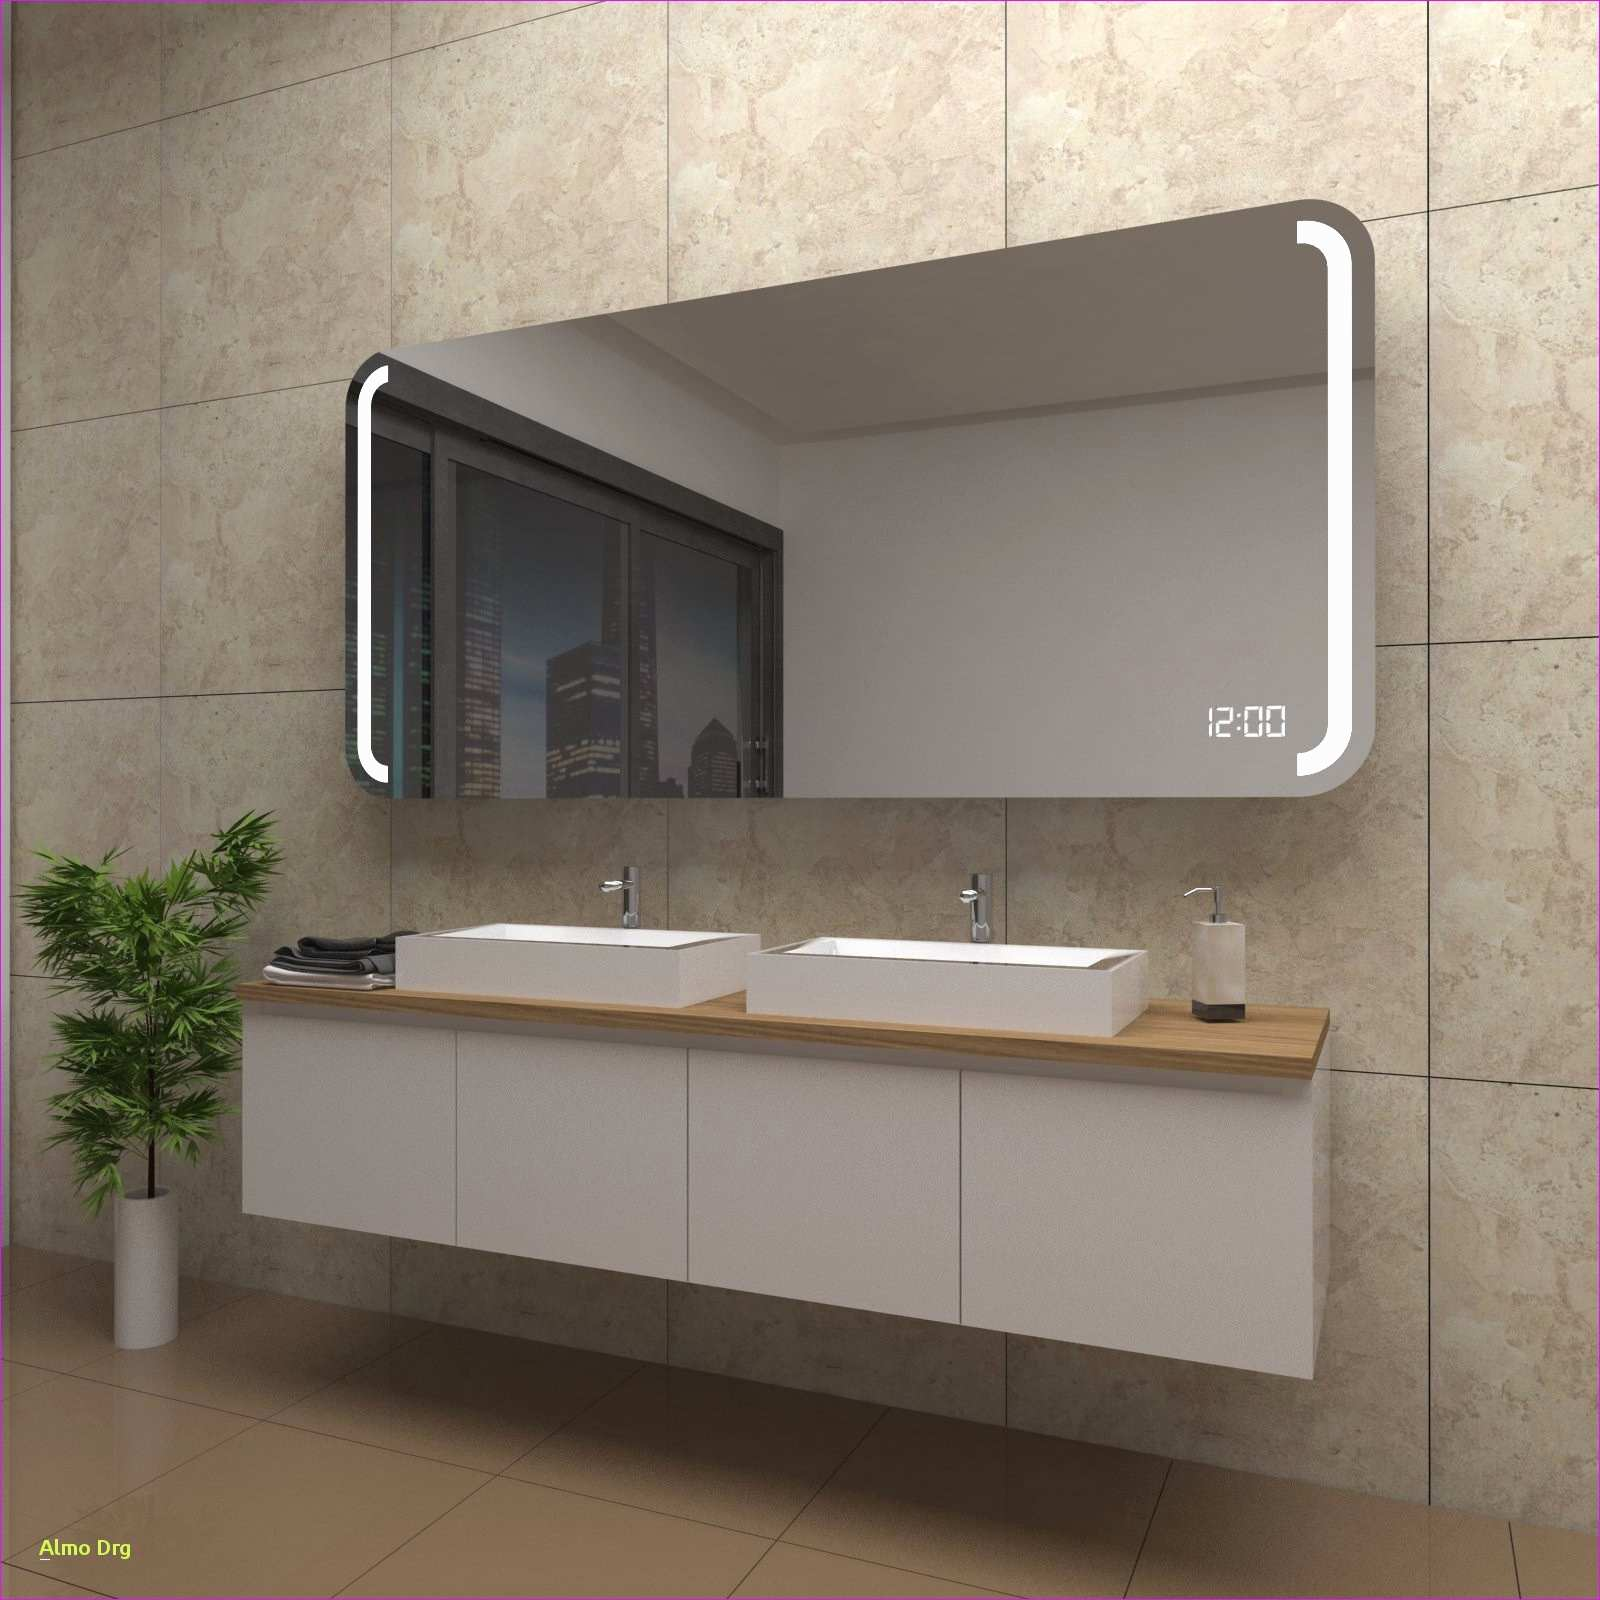 bad fliesen ideen luxus badezimmer fliesen ideen best decke badezimmer 0d archives of bad fliesen ideen